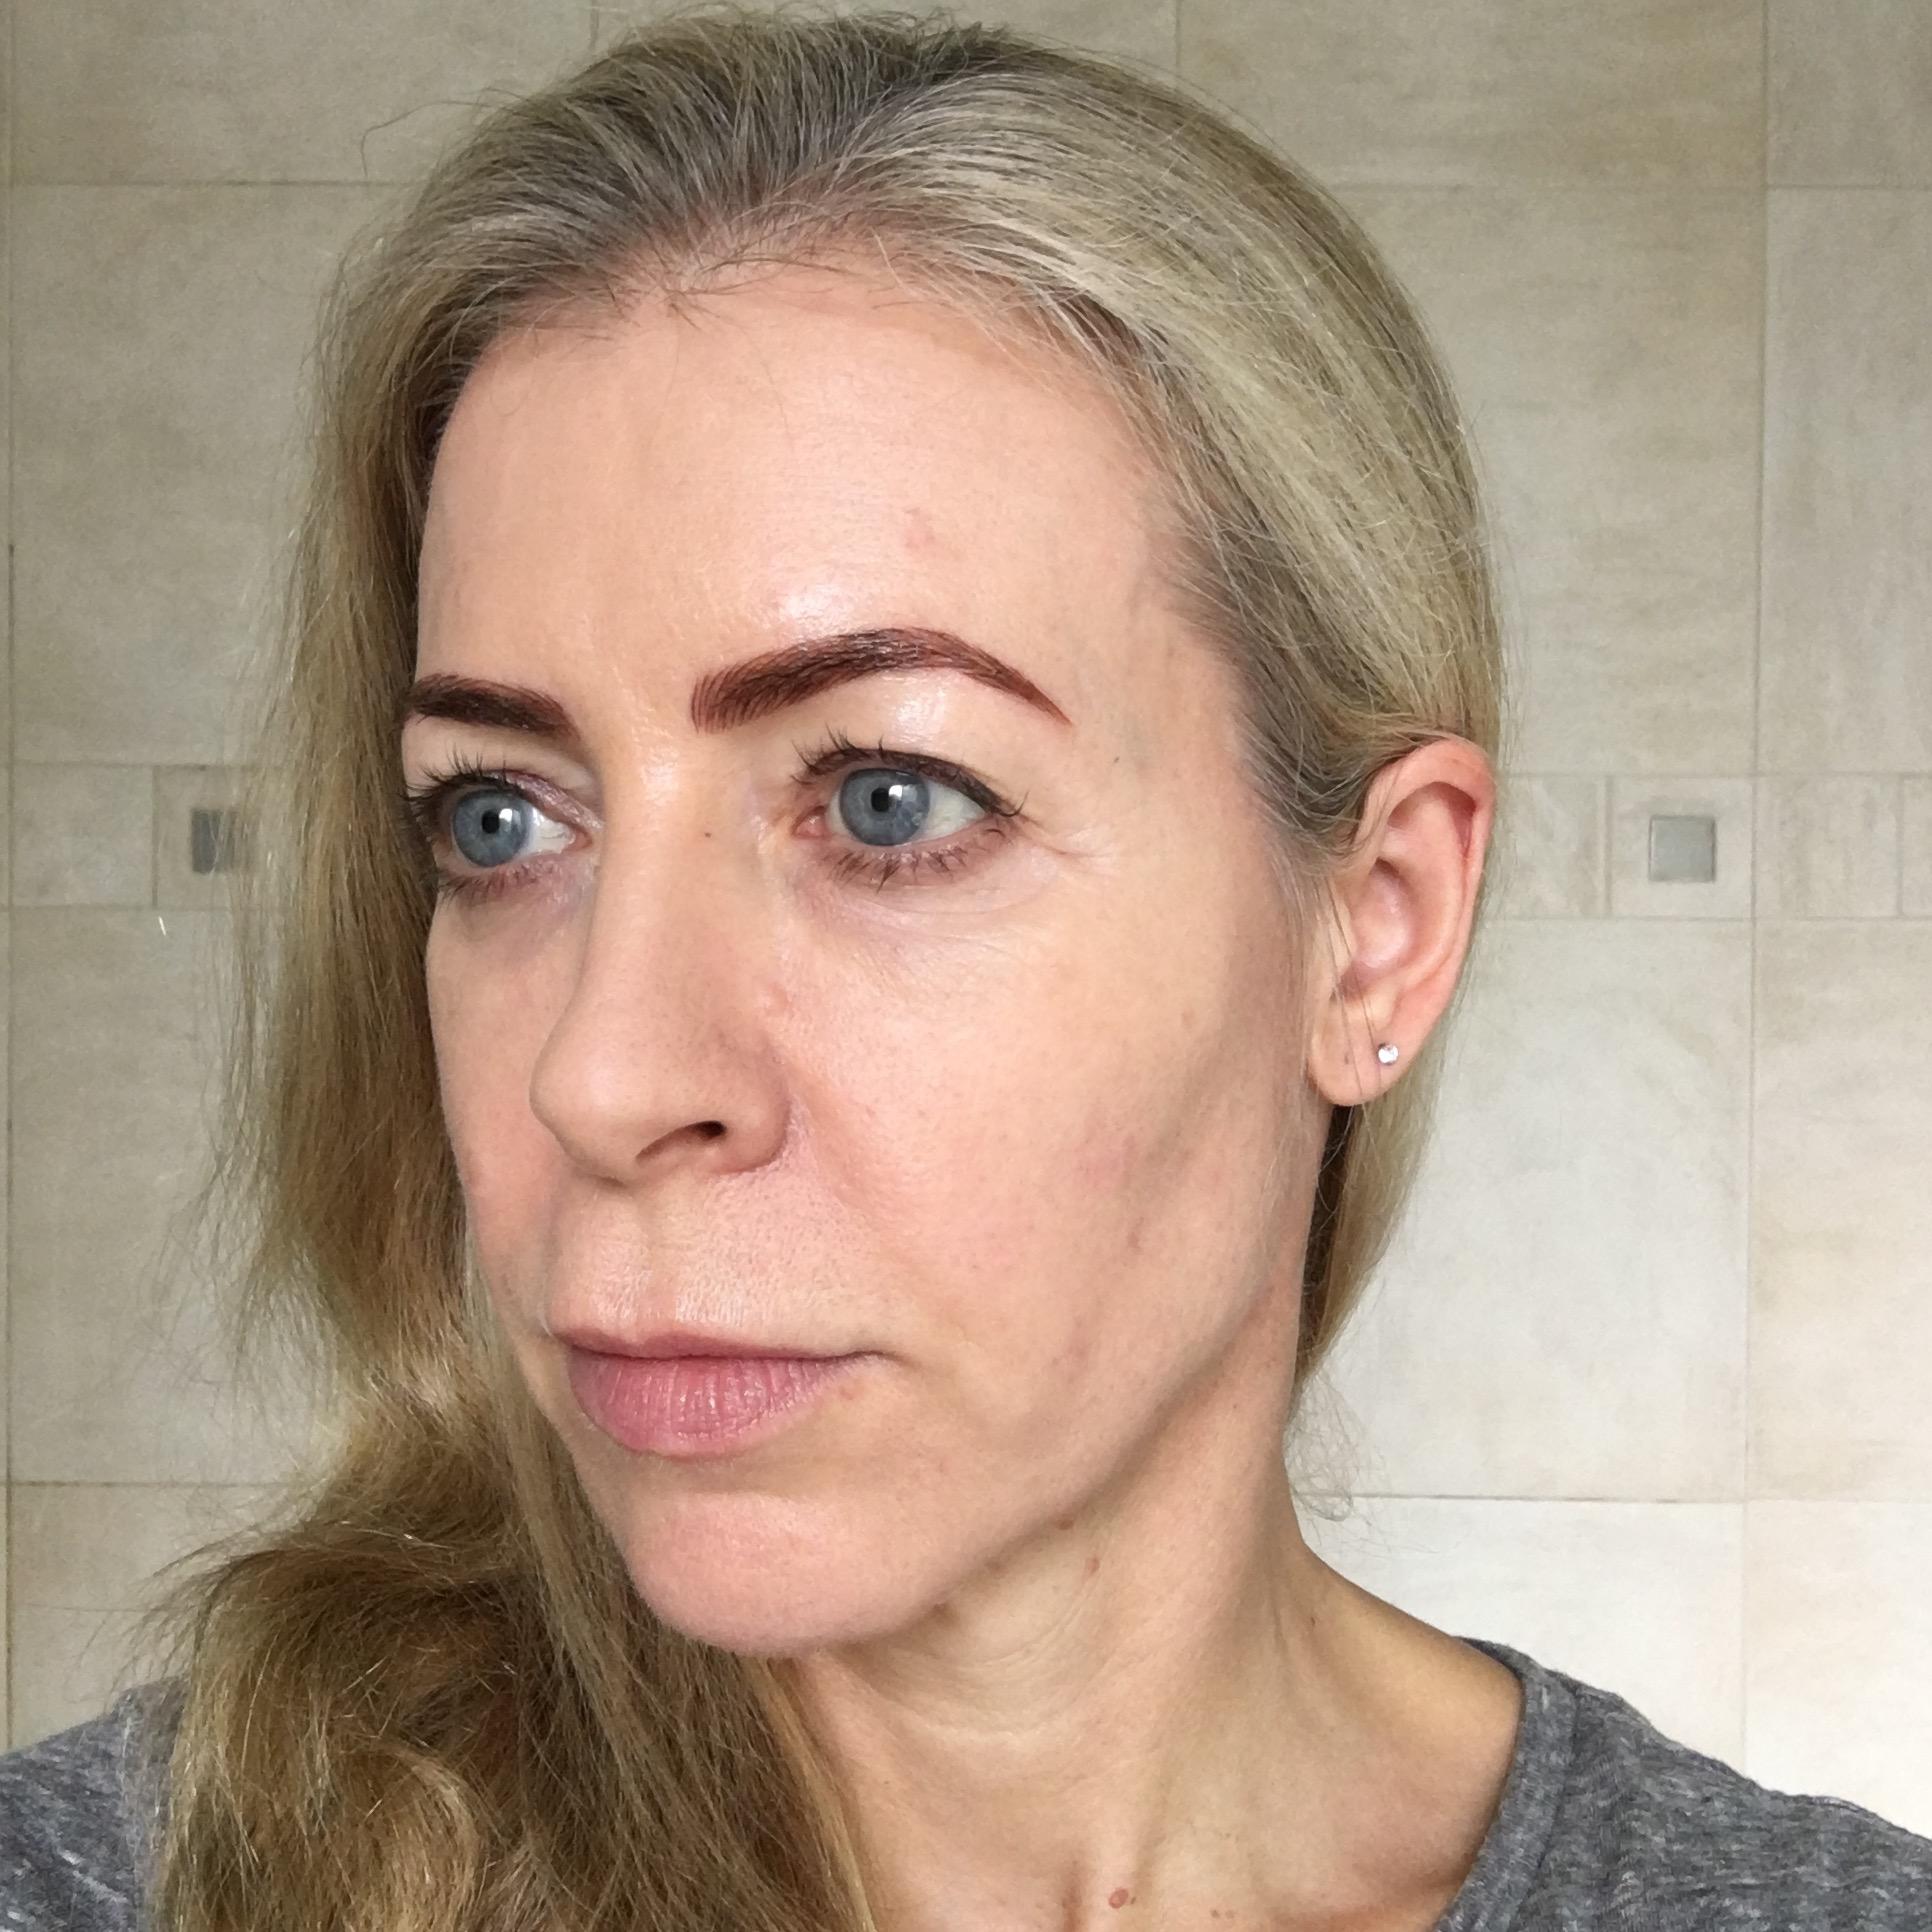 Eyebrow microblading - 10 days afterwards, looking good.